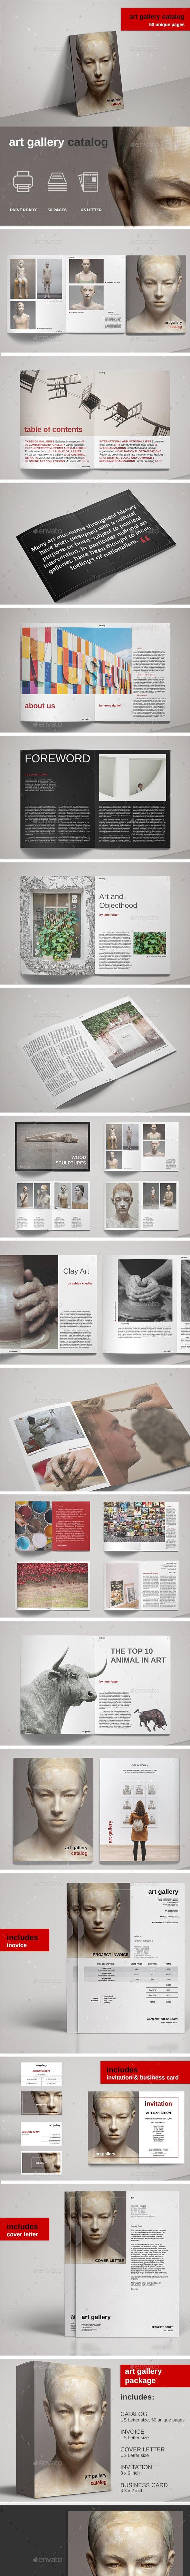 Art Gallery Exhibition Catalog - Catalogs Brochures